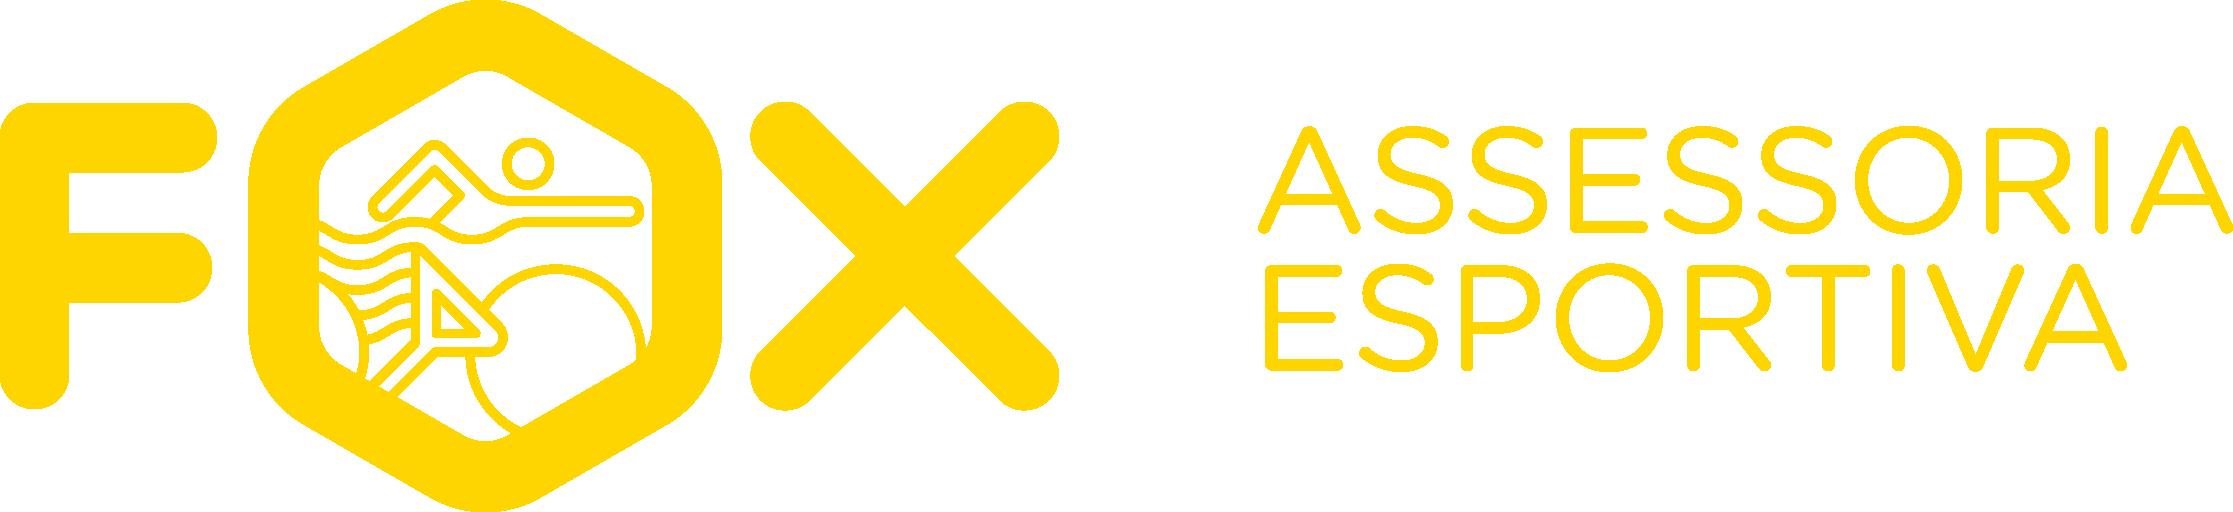 Fox Assessoria Esportiva